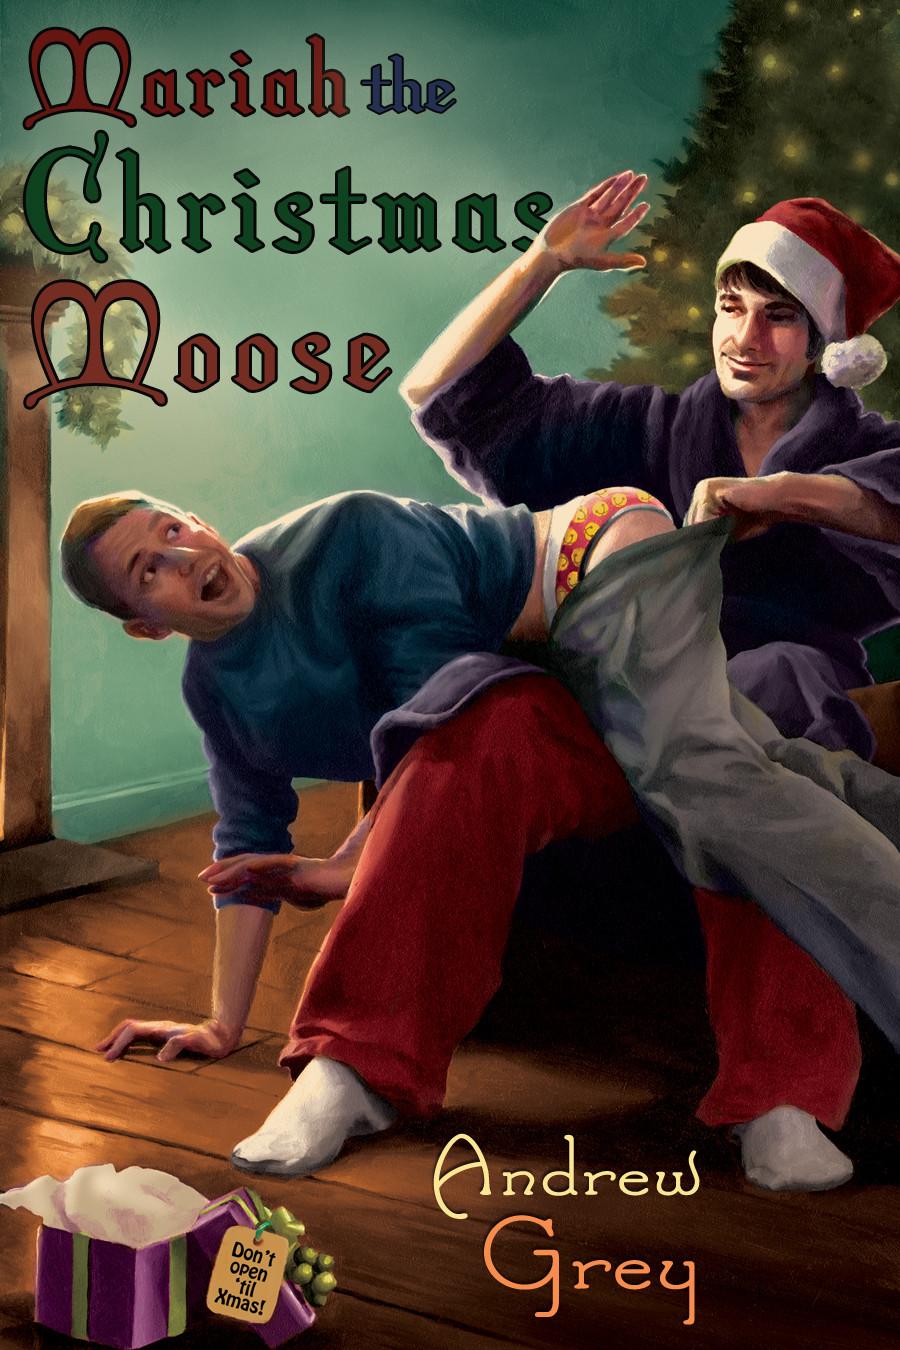 Mariah the Christmas Moose